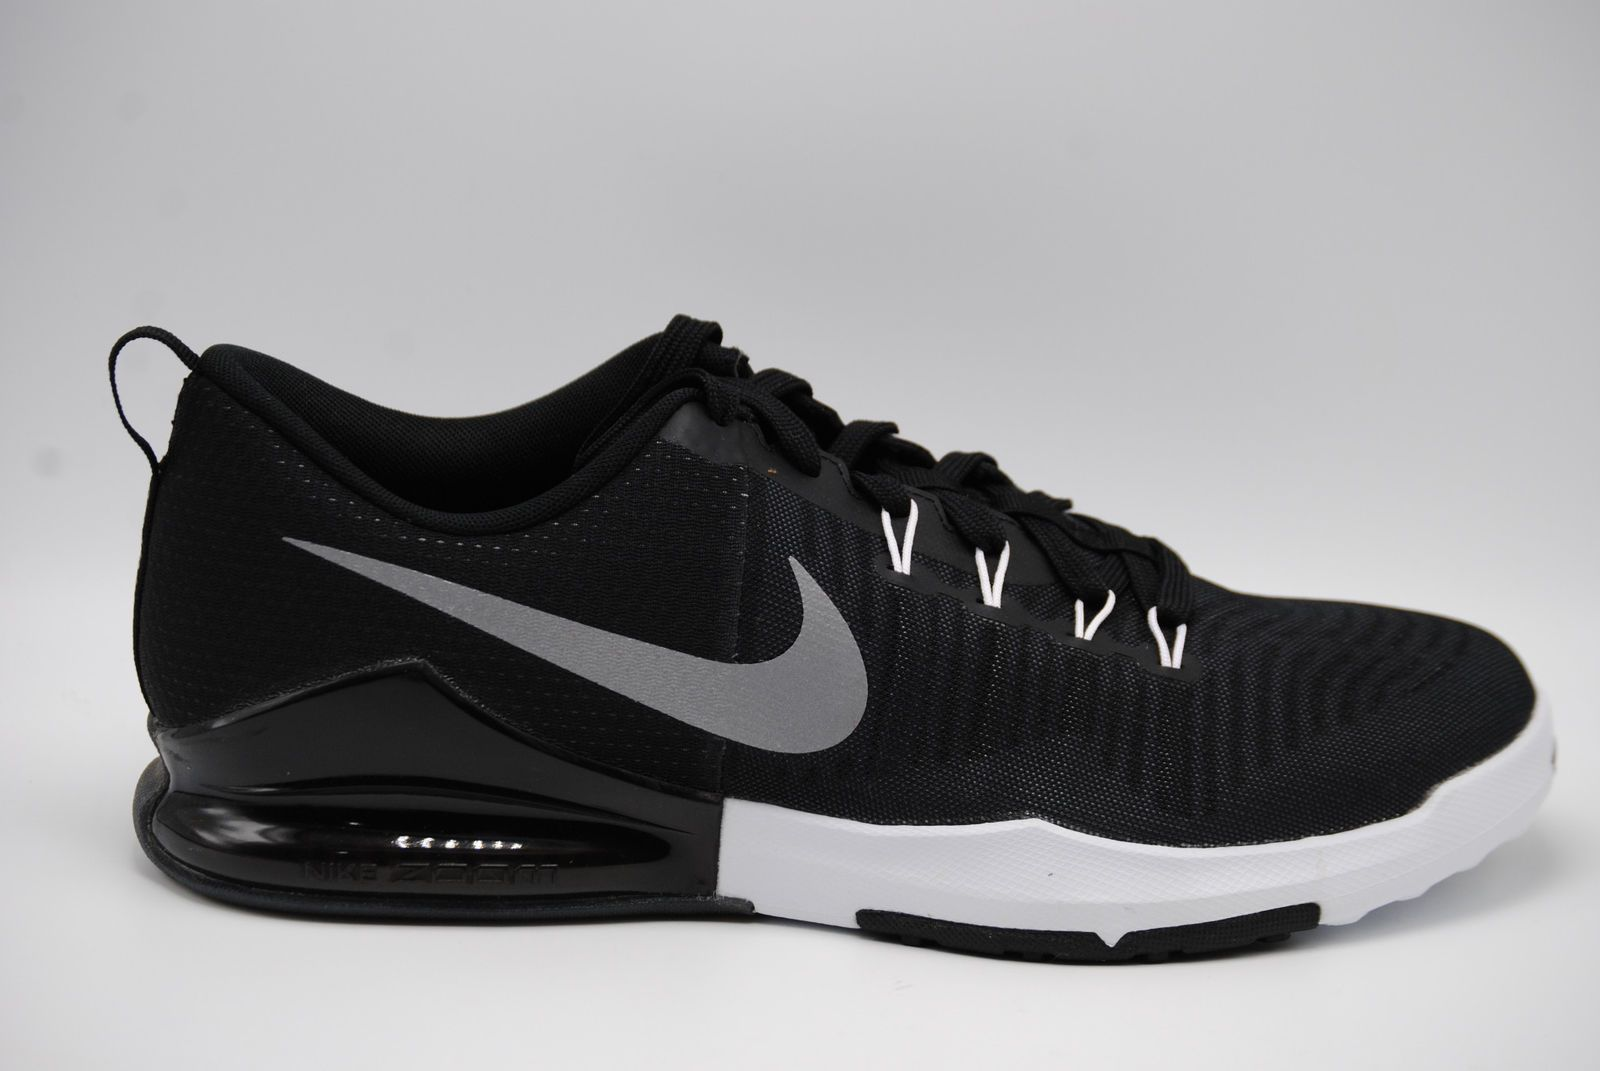 best website 71d77 c51f5 Nike Zoom Train Action Mens sneakers 852438 003 Multiple sizes